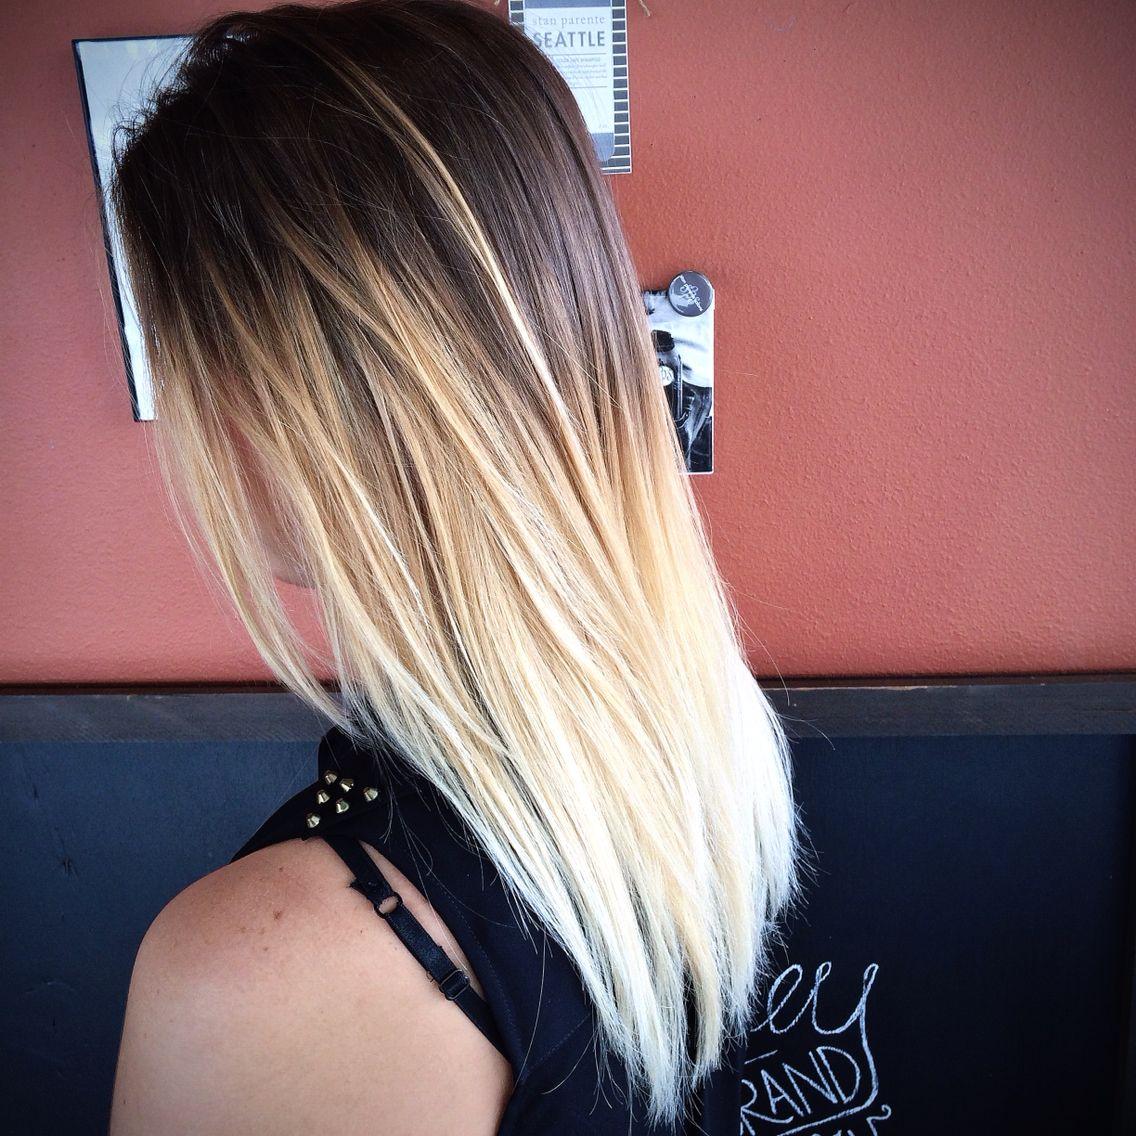 Ombré    Balayge with a long layered haircut #ombré #anton_thestylist @AntonSloboda #ombre #haircolor #hair #balayage #beautiful #stanparentesalons #antonsloboda #wella #oribe www.stanparantesalon.com